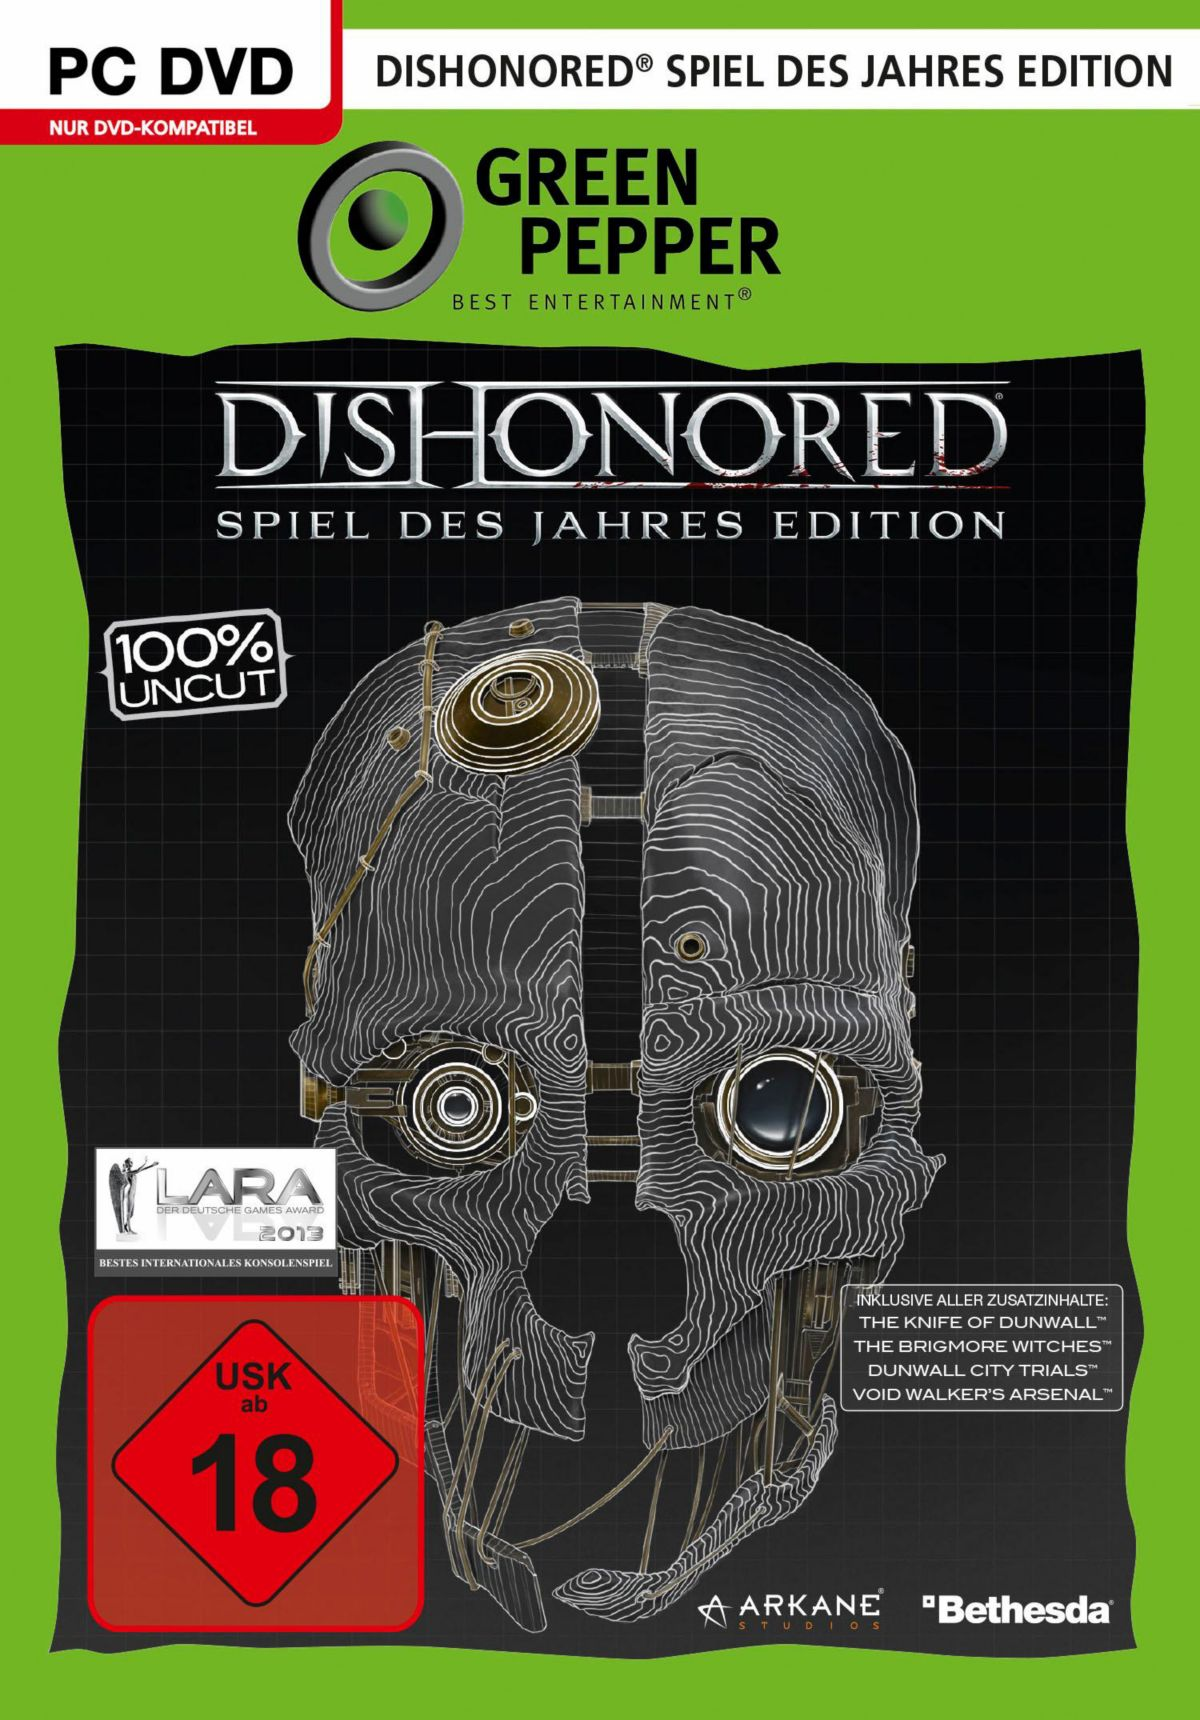 Dishonored - Spiel des Jahres Edition PC